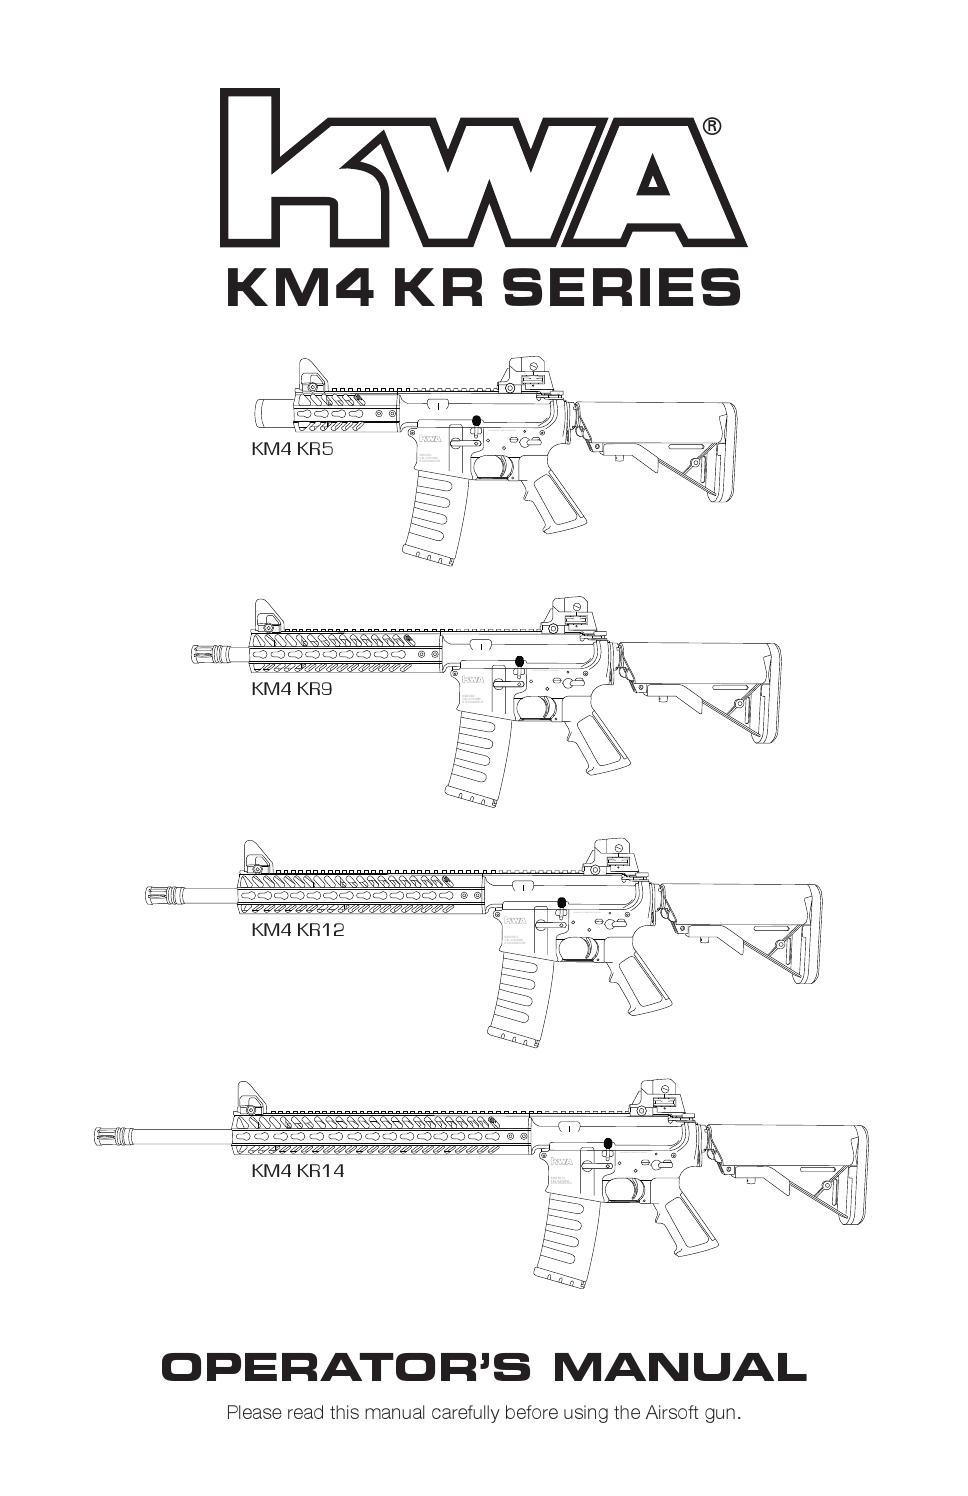 Kwa aeg 25 vm4a1 operator manual by kwa usa issuu user manual km4 kr series sciox Gallery